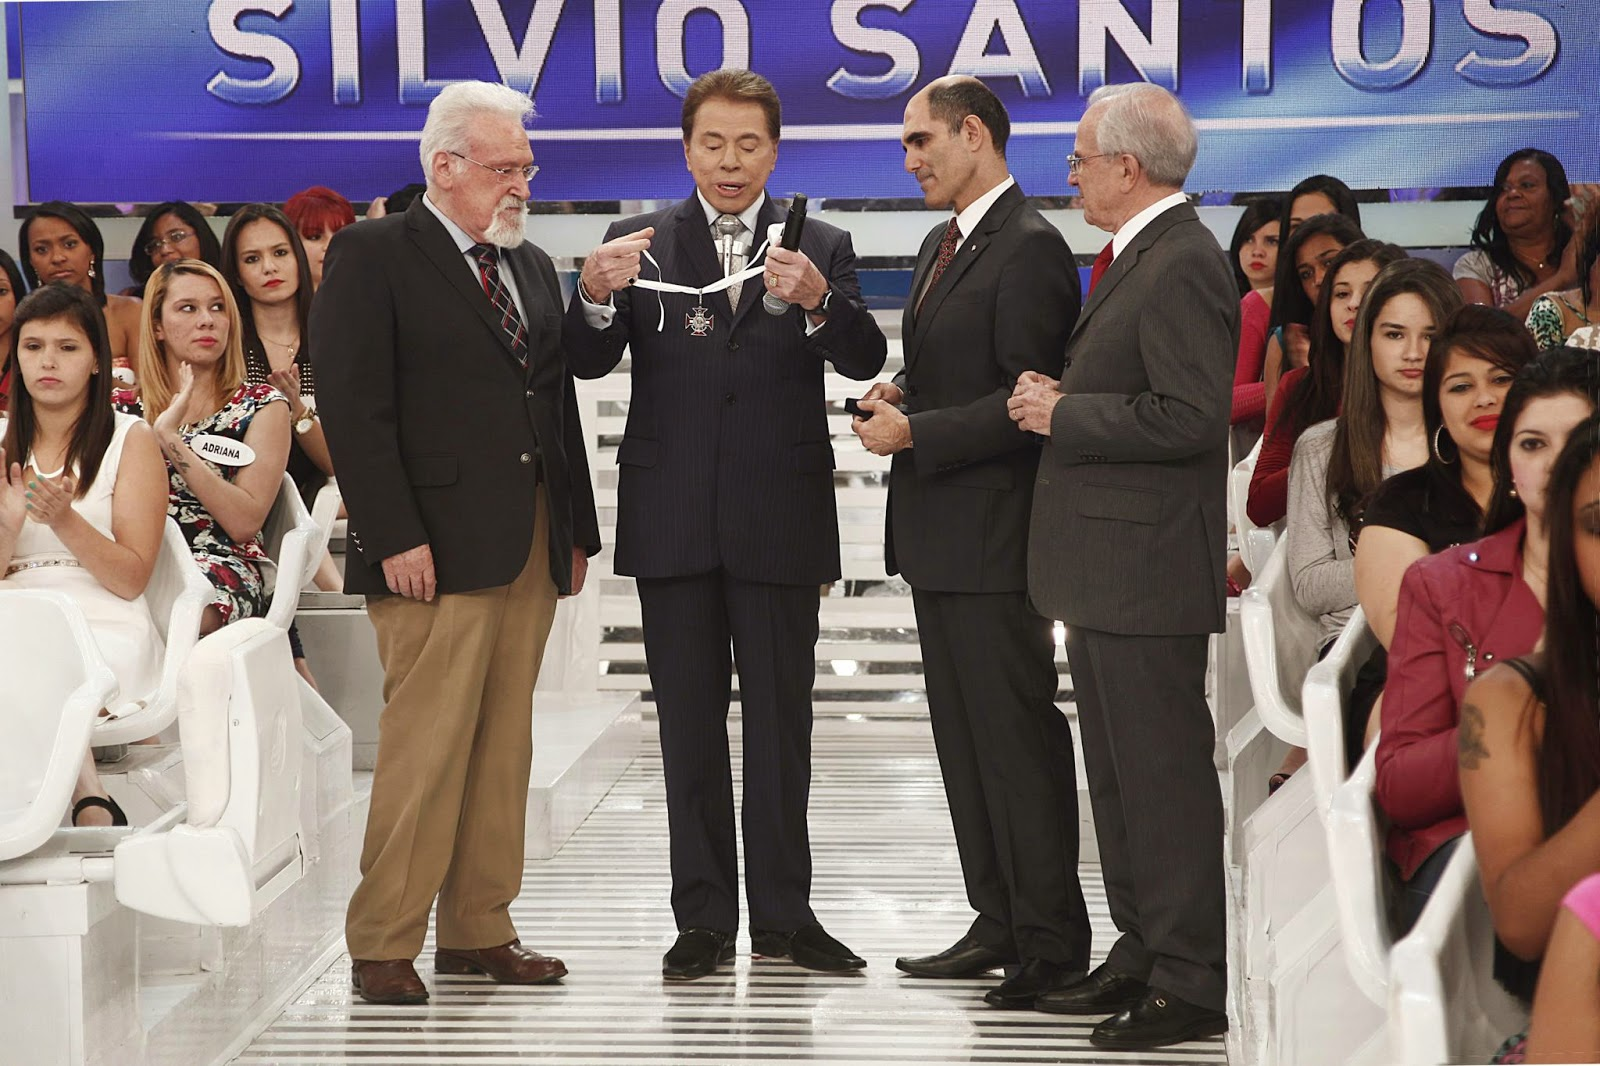 Antonio dos Ramos, Silvio Santos, Paulo Machado e Fernando Ramalho  (Crédito: Roberto Nemanis SBT)